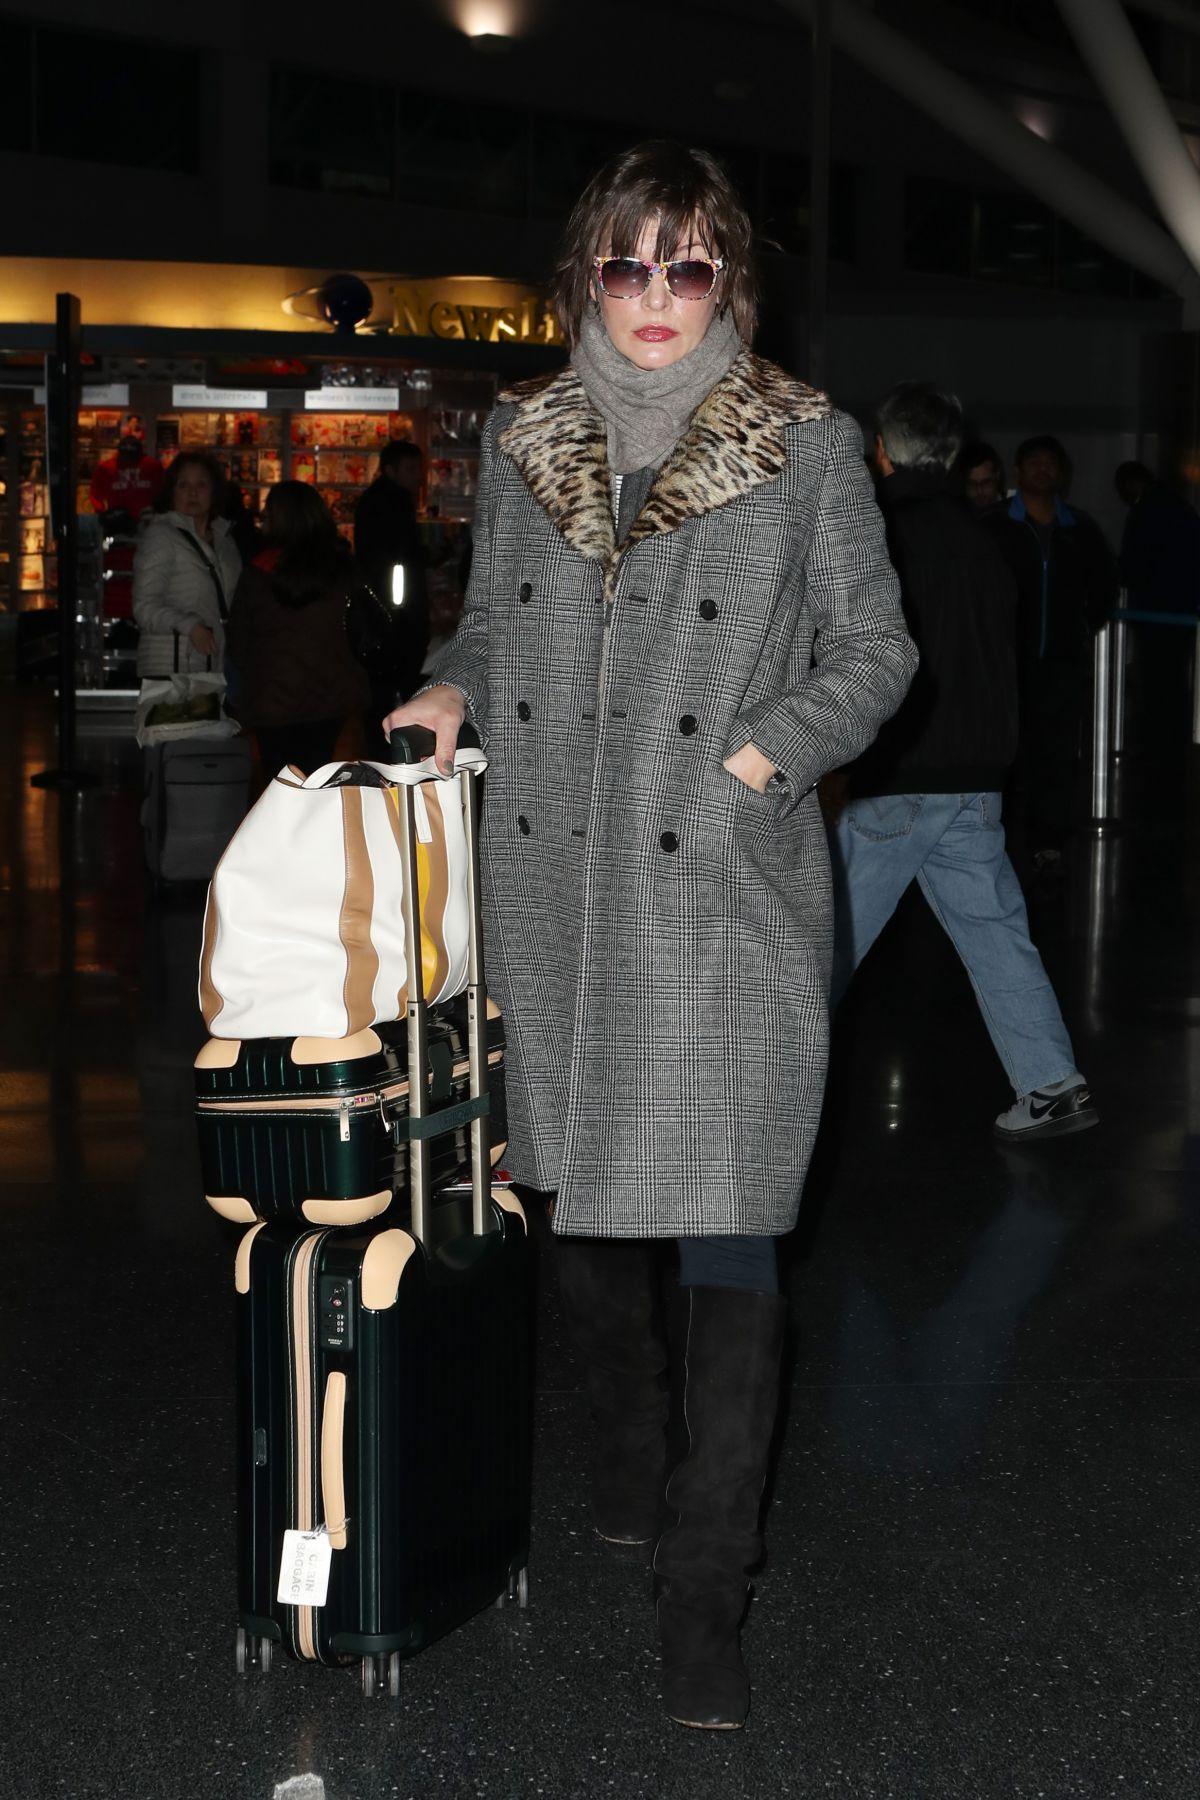 MILLA JOVOVICH at Los Angeles International Airport 01/25/2017